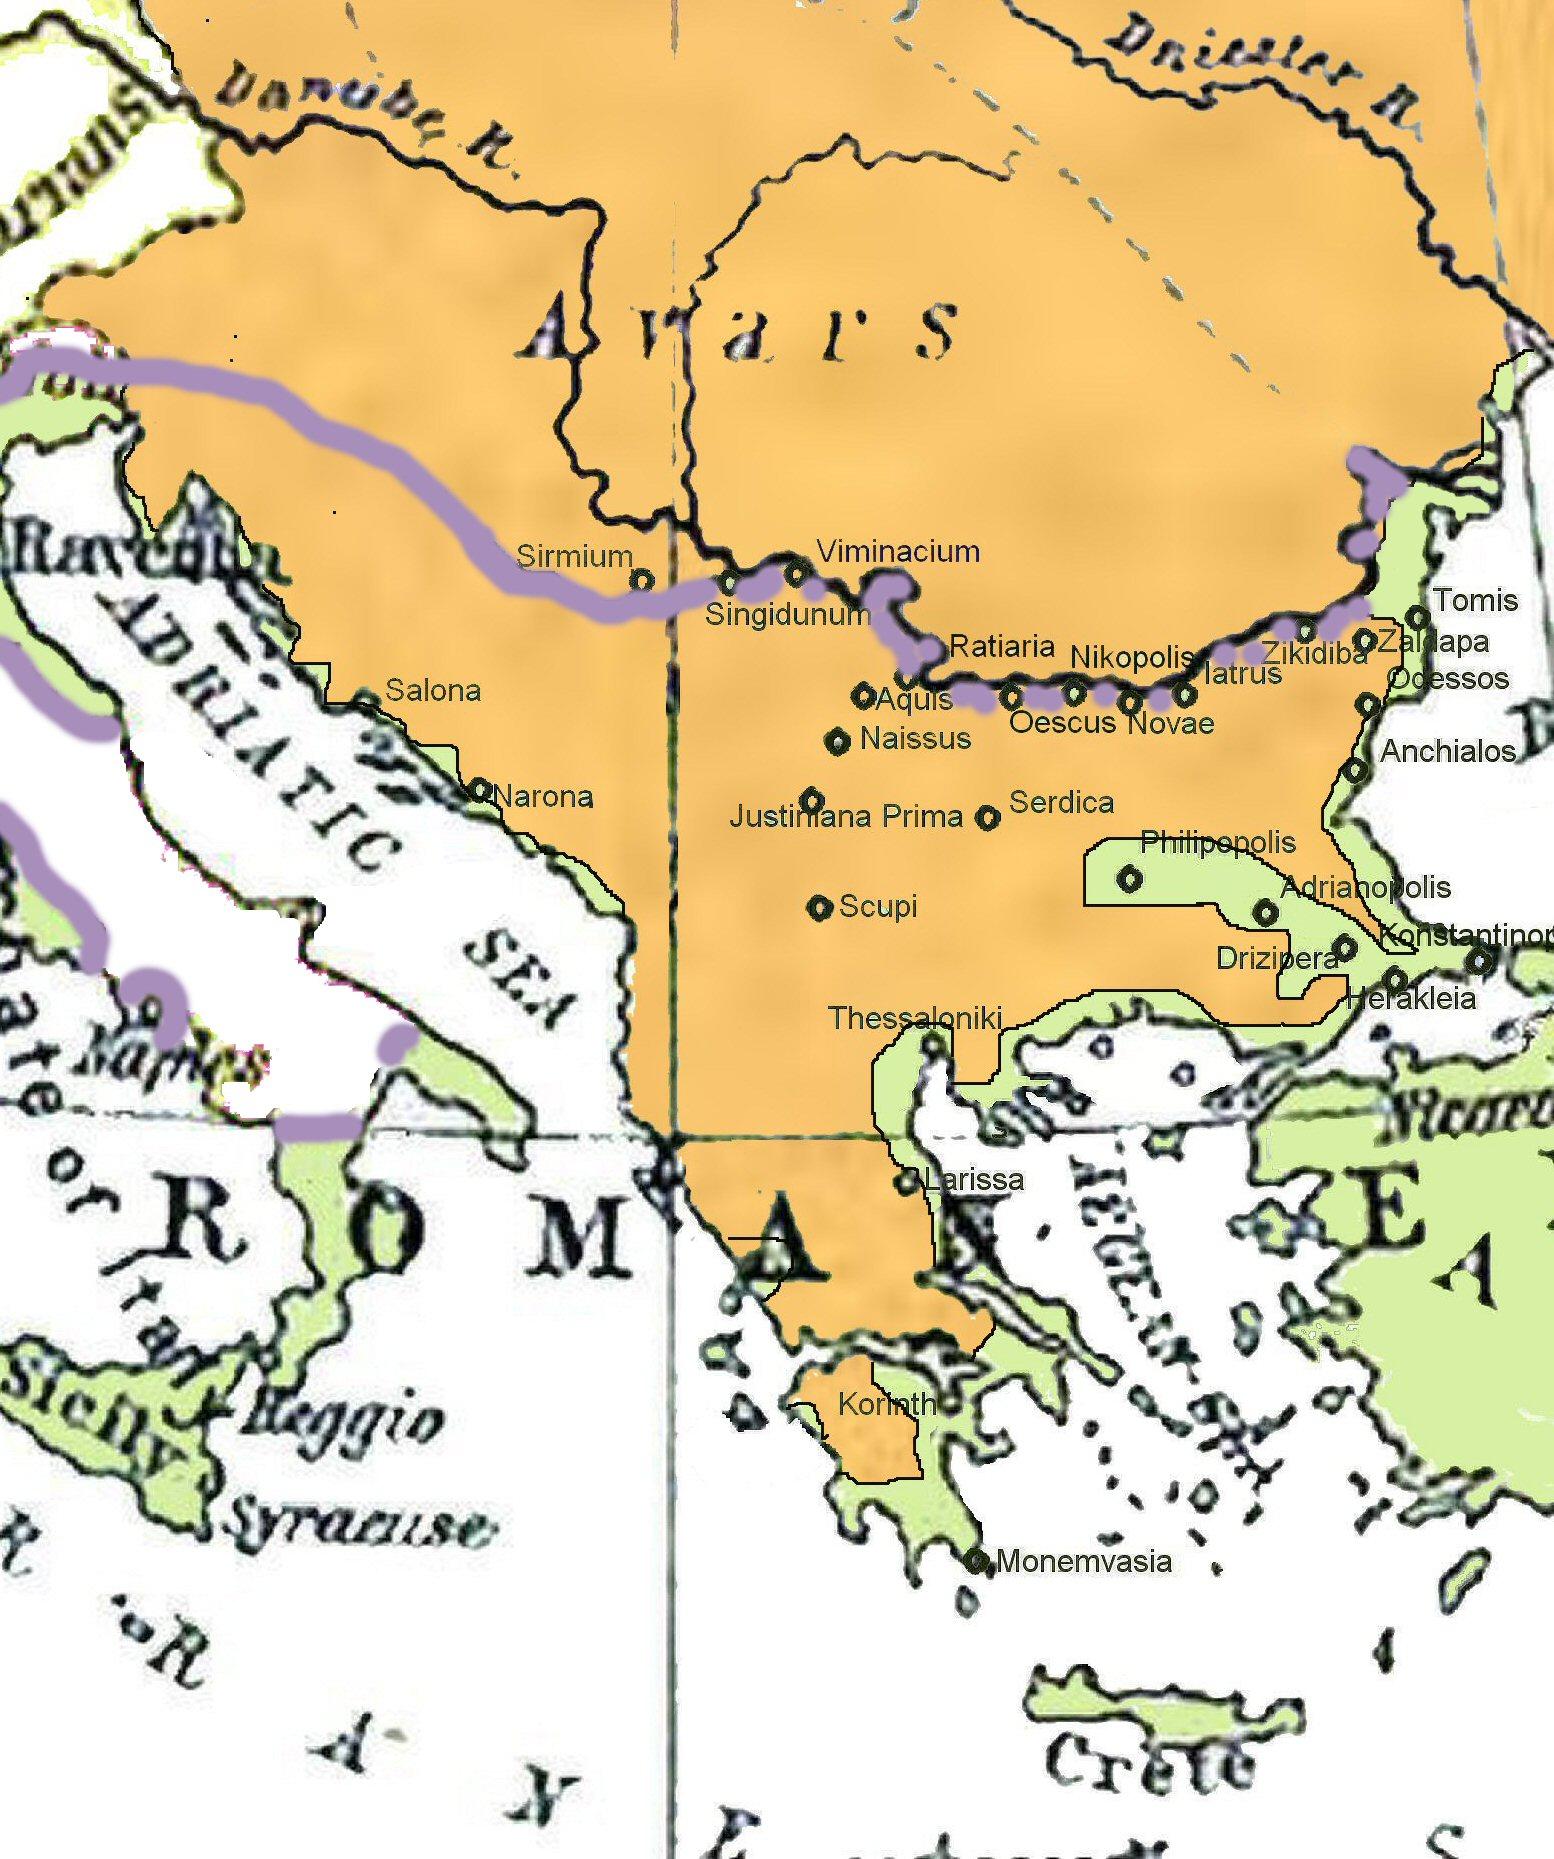 https://upload.wikimedia.org/wikipedia/commons/8/86/Balkans650.jpg